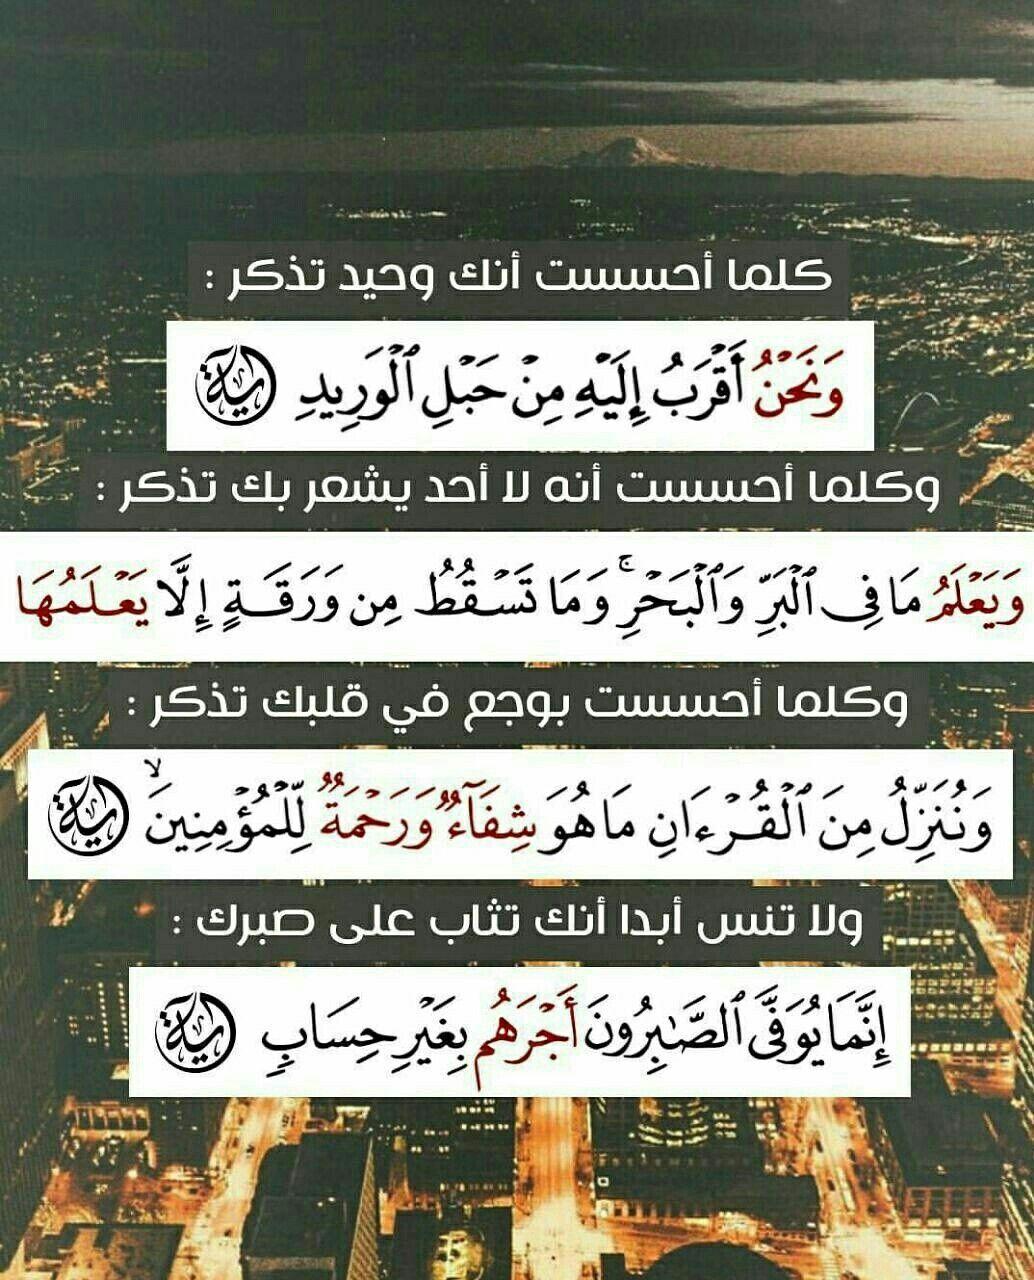 Pin By Max Skay On صدقه جاريه لأبي Islamic Quotes Quran Quran Quotes Quran Verses